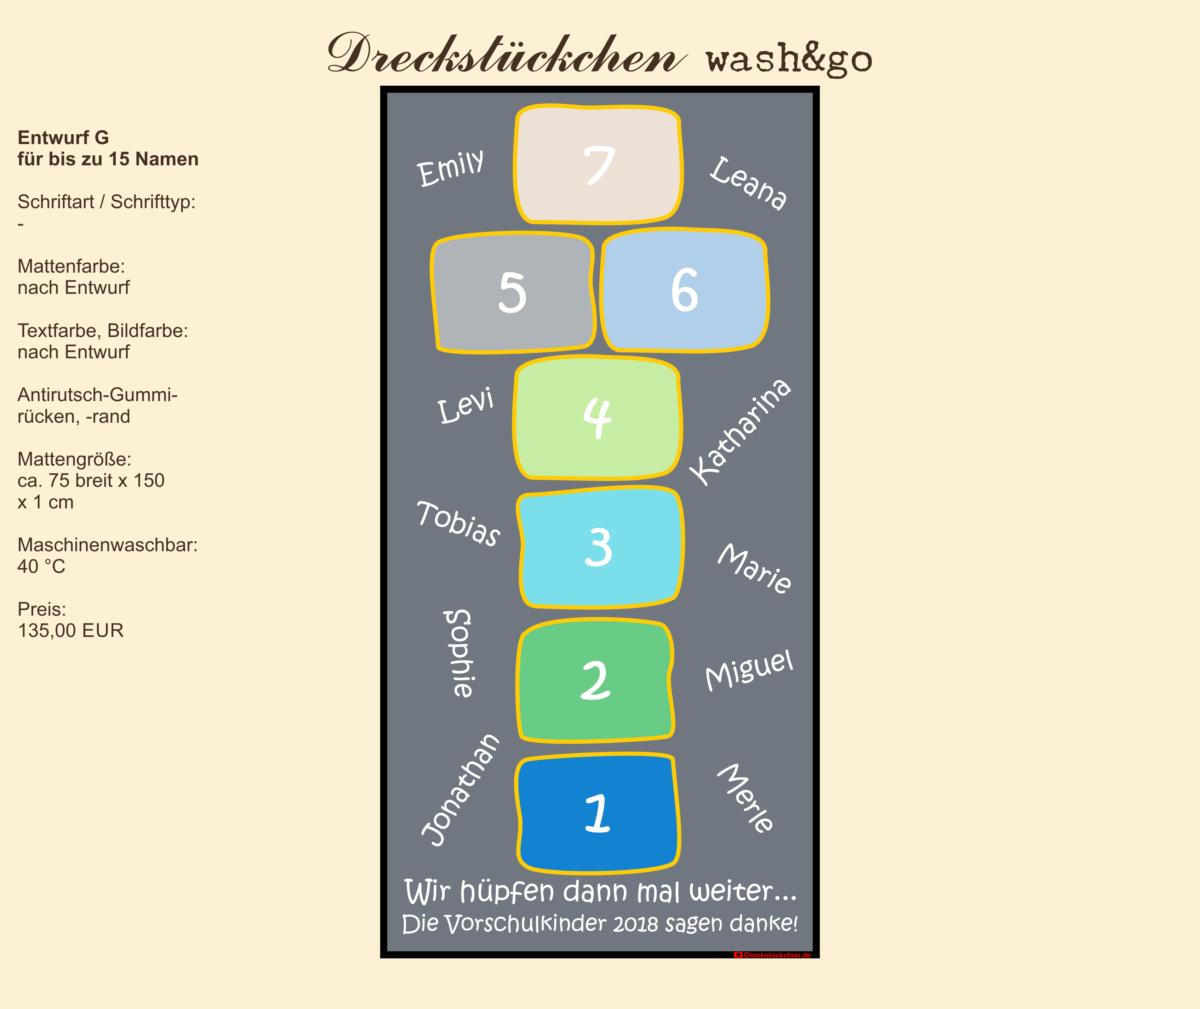 Dreckstückchen: Kindergarten Abschiedsmatte 75x150G